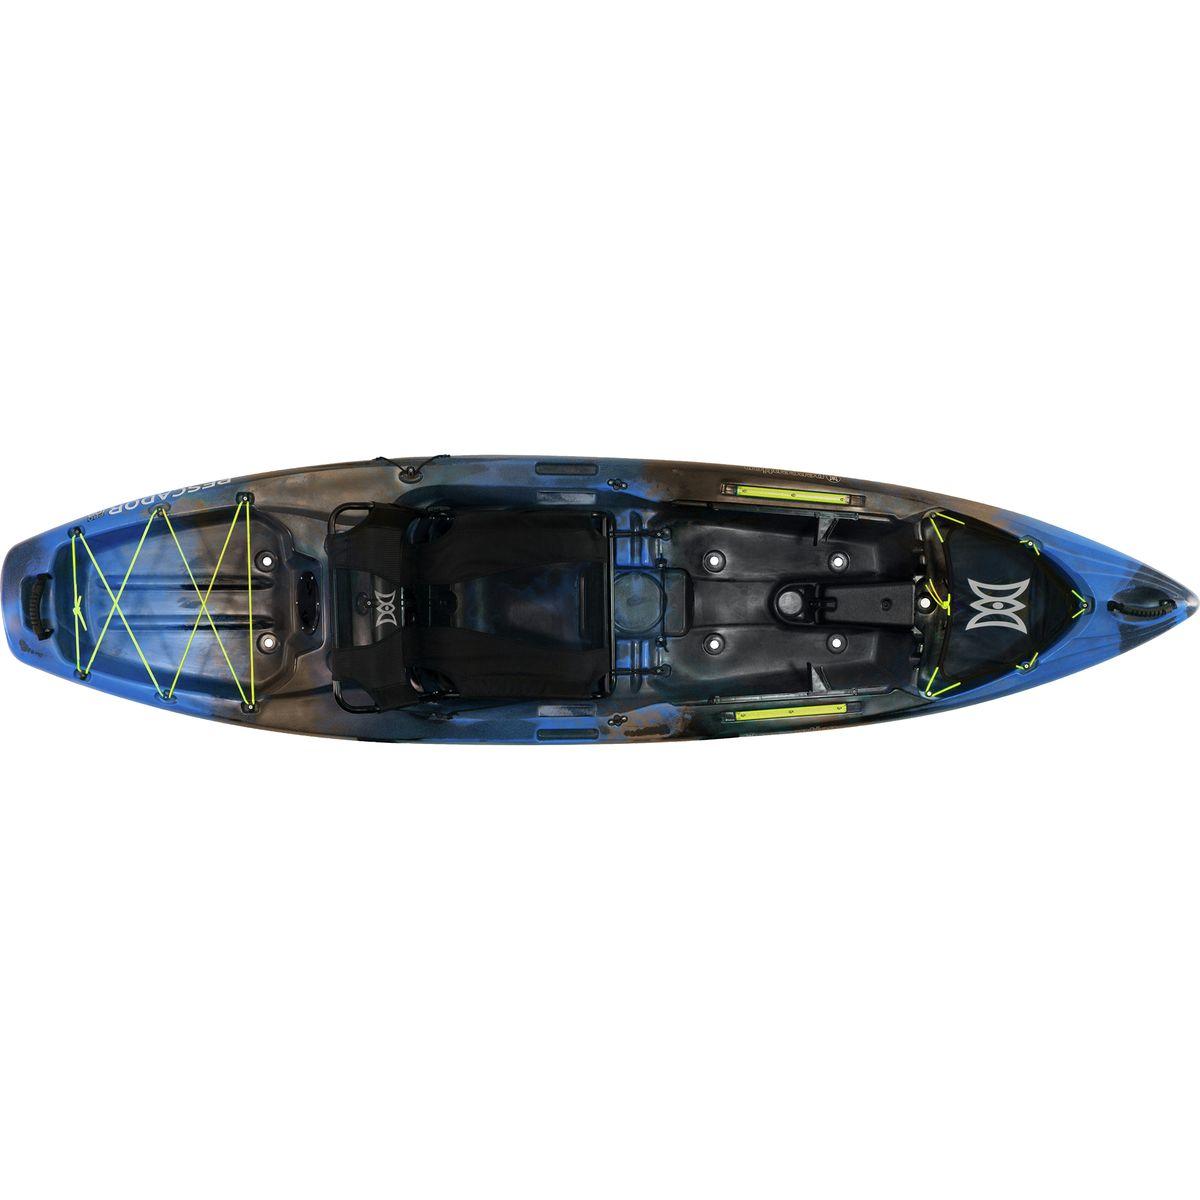 Perception Pescador Pro 10.0